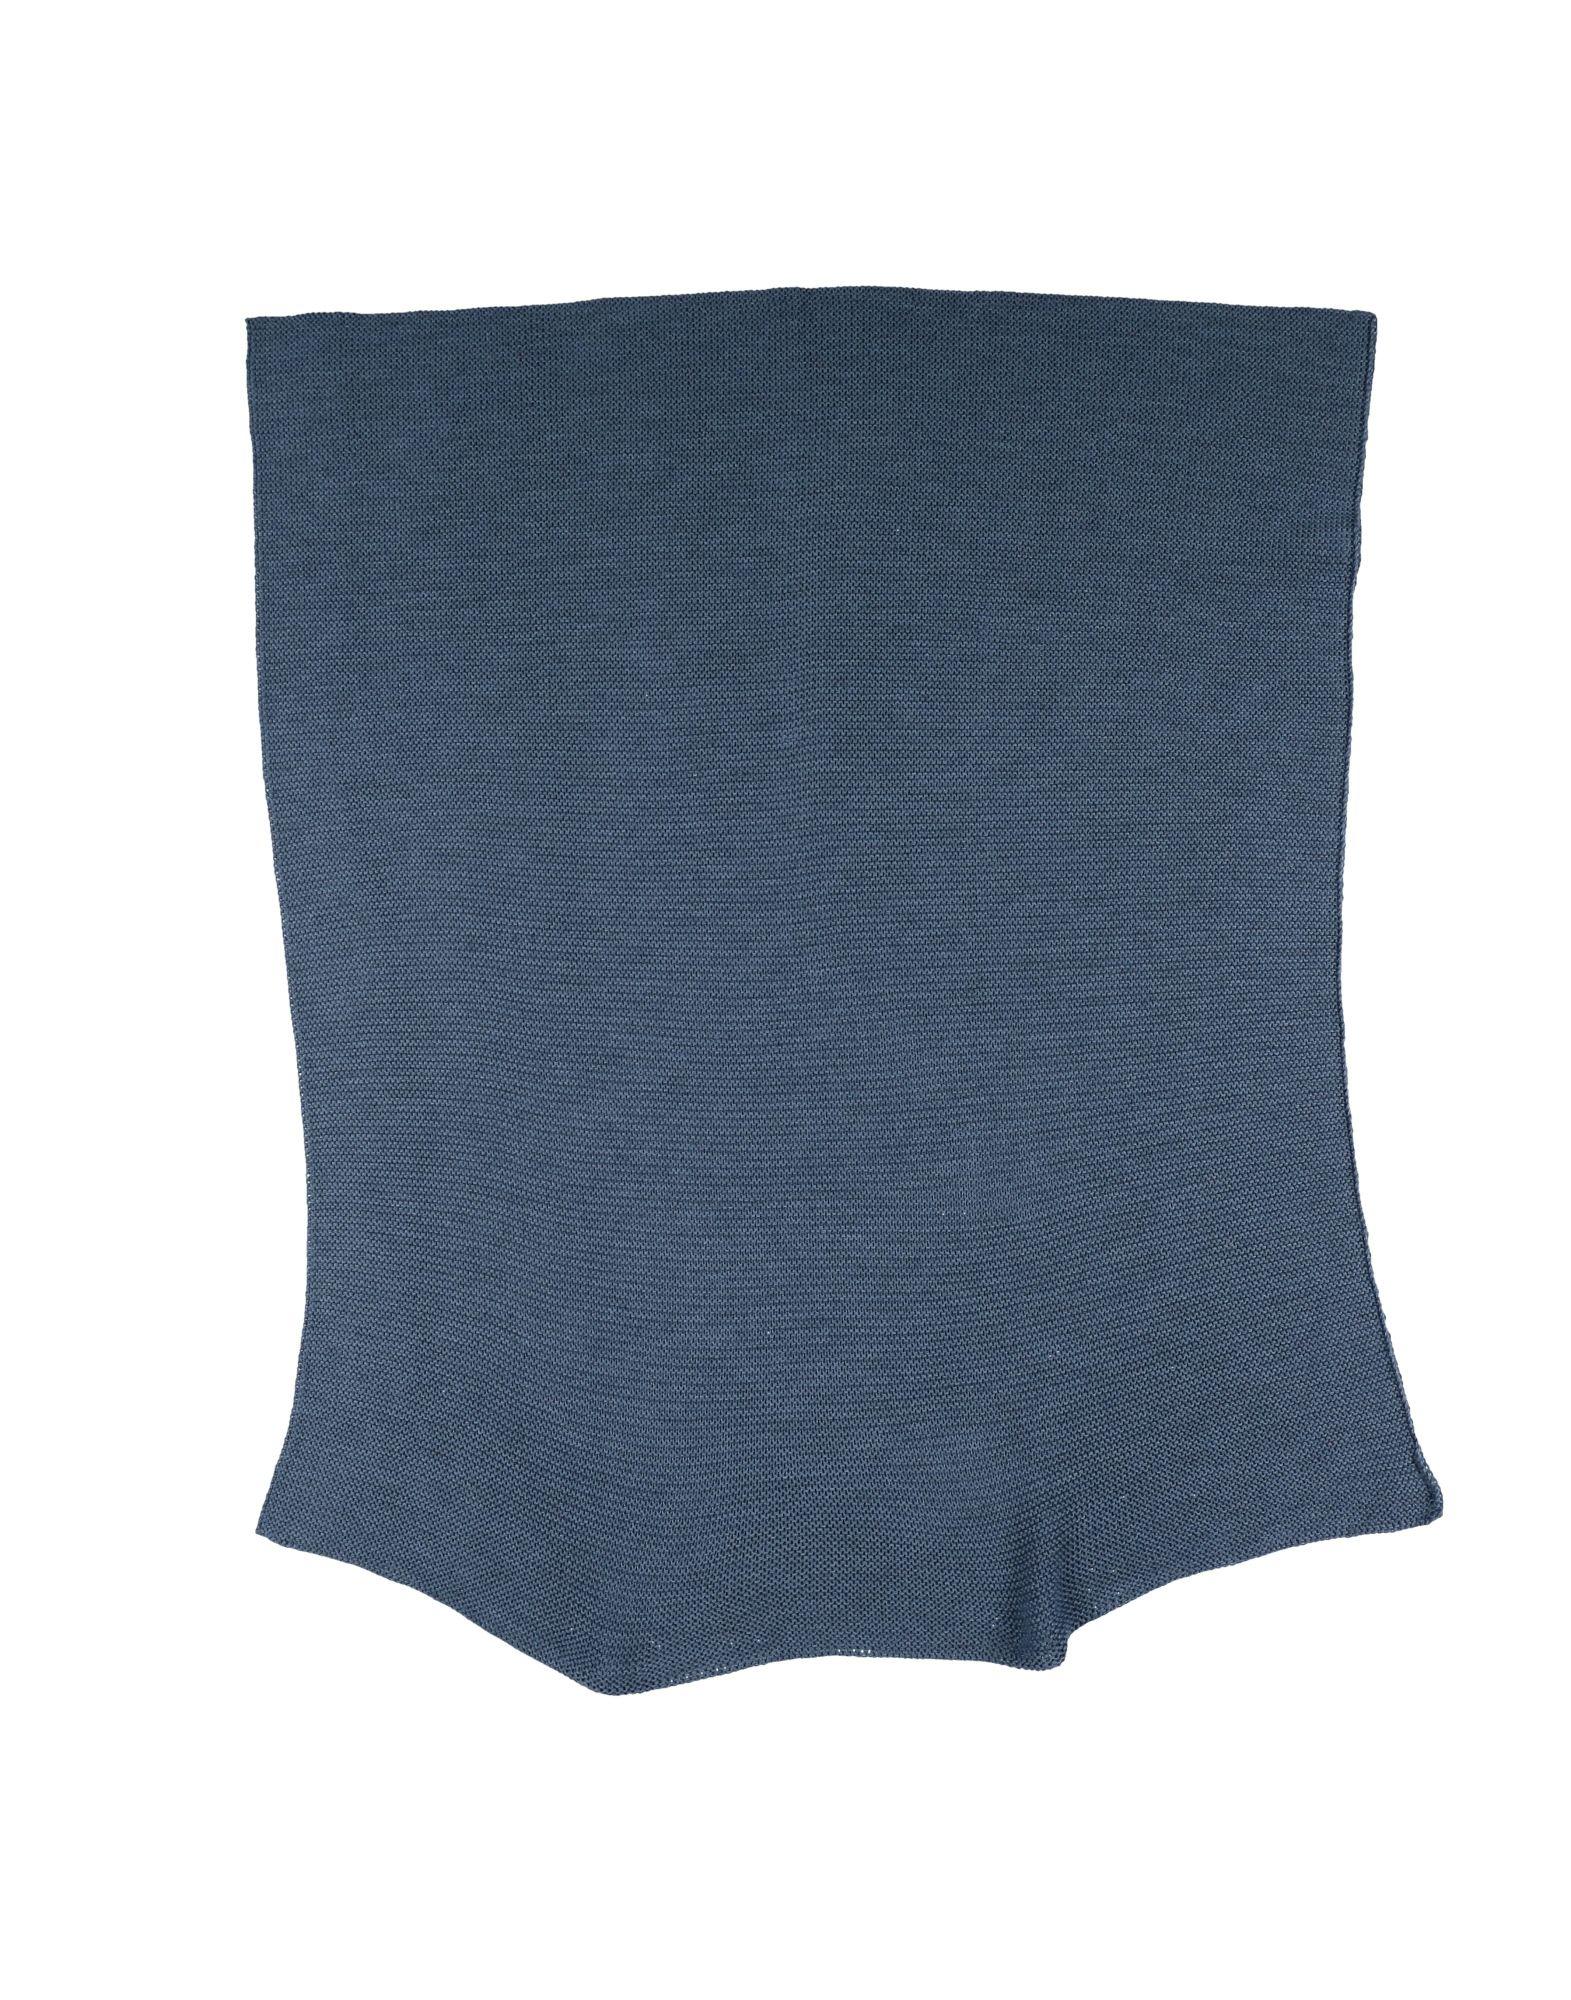 FILOBIO Одеяльце для младенцев molo одеяльце для младенцев